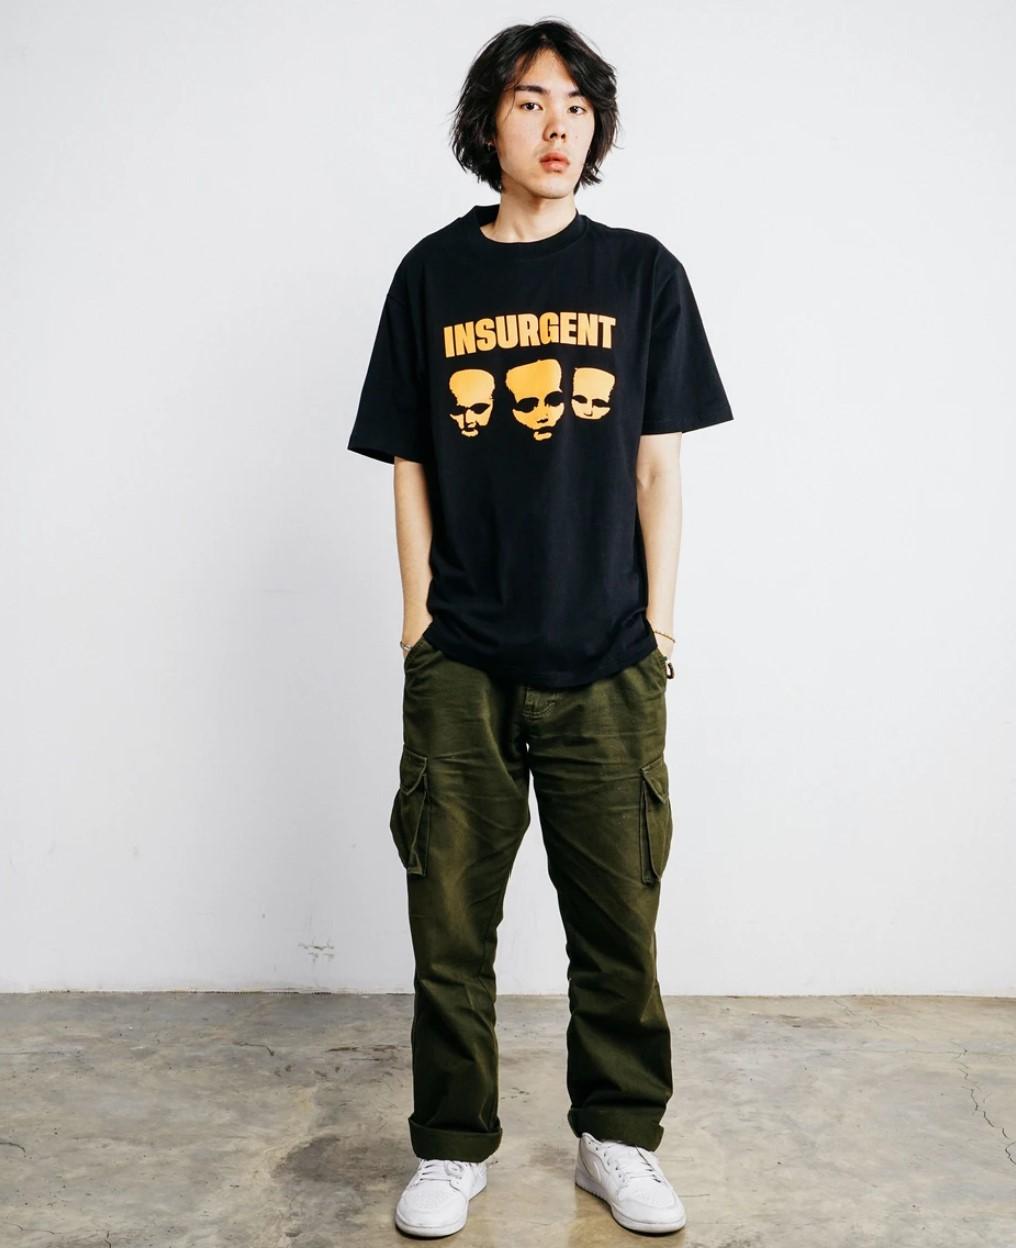 Insurgent Club(インサージェントクラブ)  スリーチャイルドTシャツ